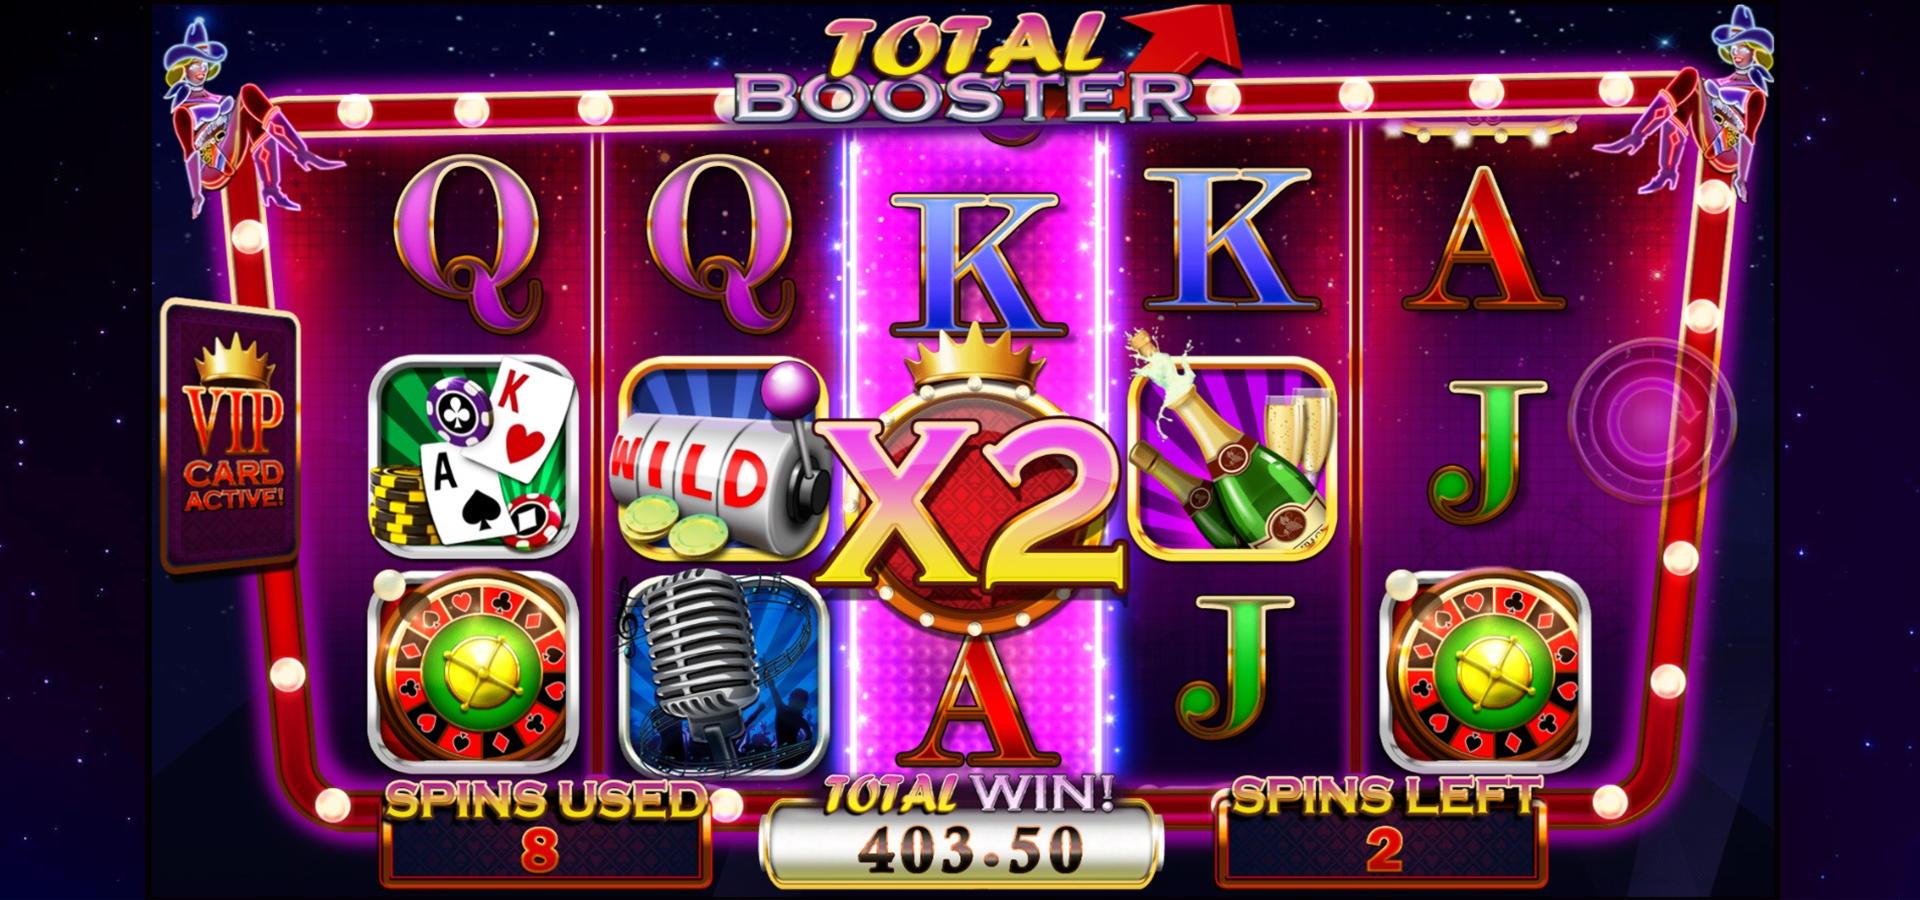 110 Free Spins no deposit casino at Inter Casino